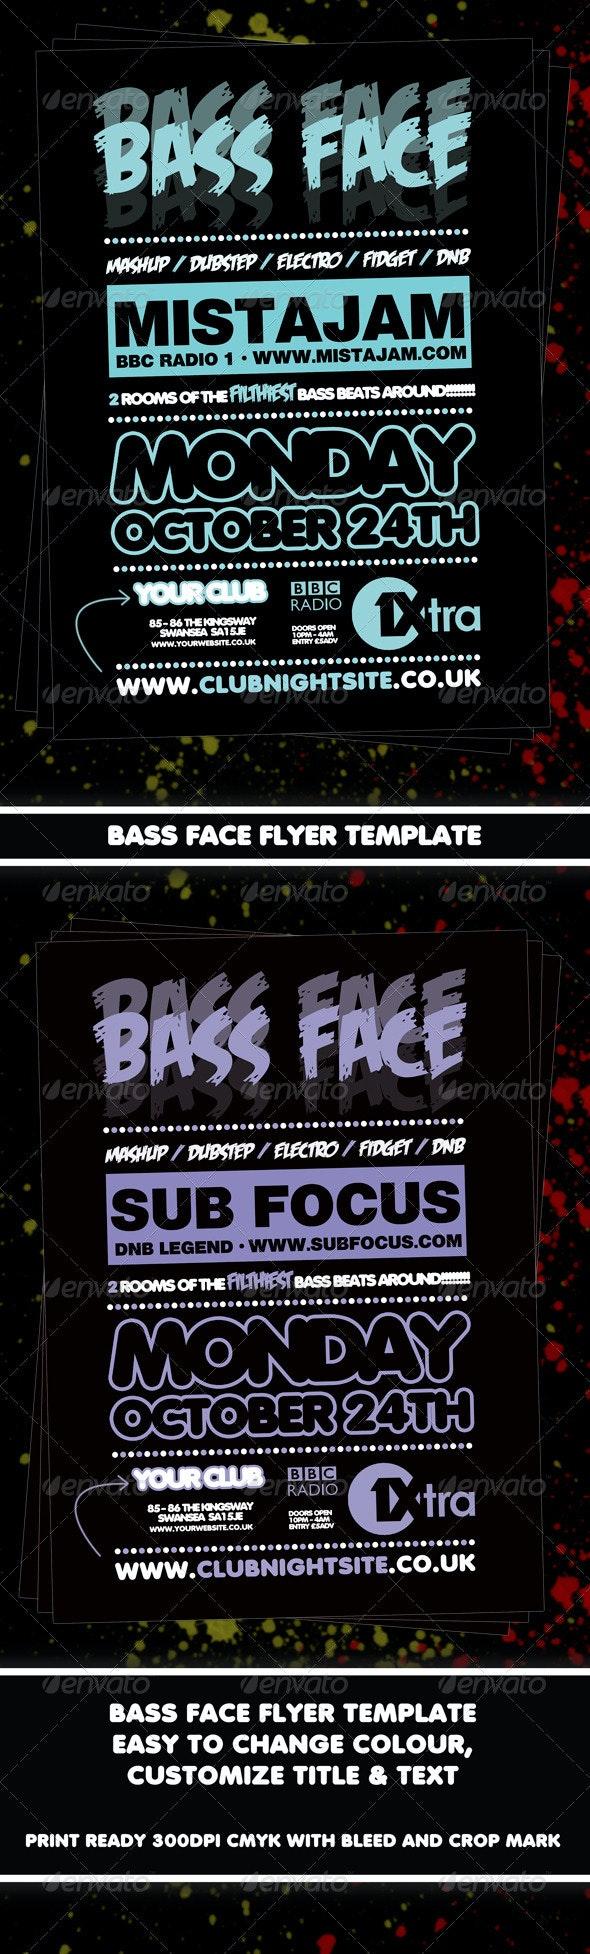 Bass Face Flyer Template - Clubs & Parties Events